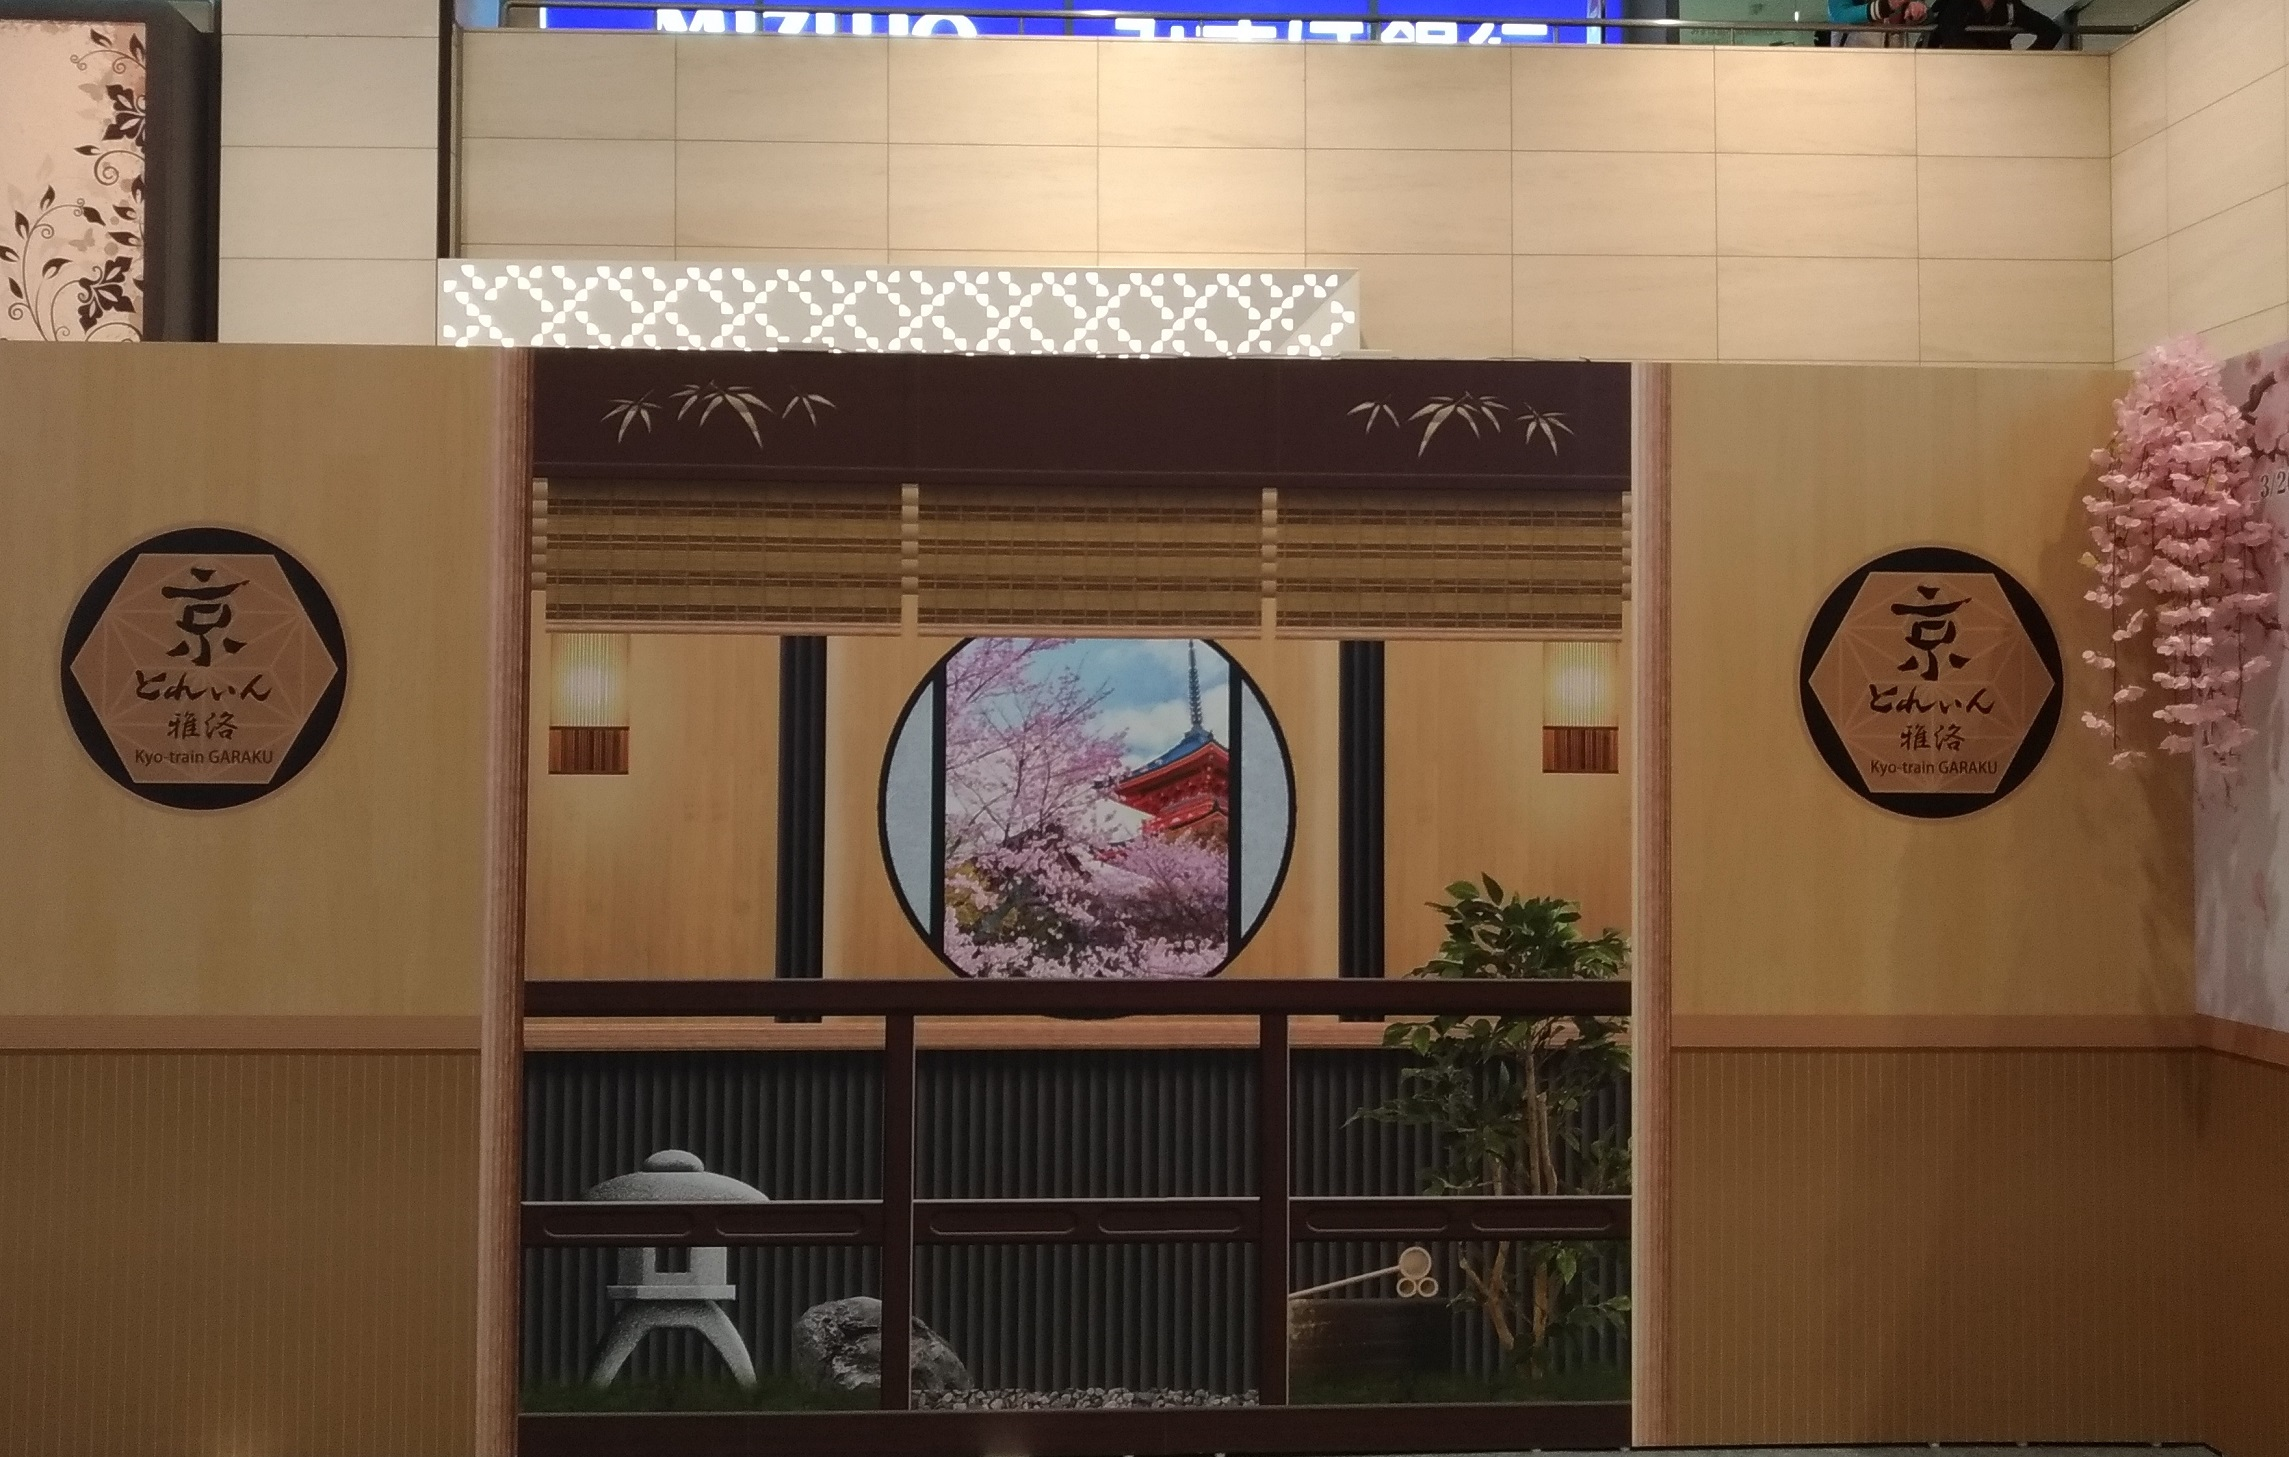 osaka_hankyu_train_kyo_garaku_3.jpg